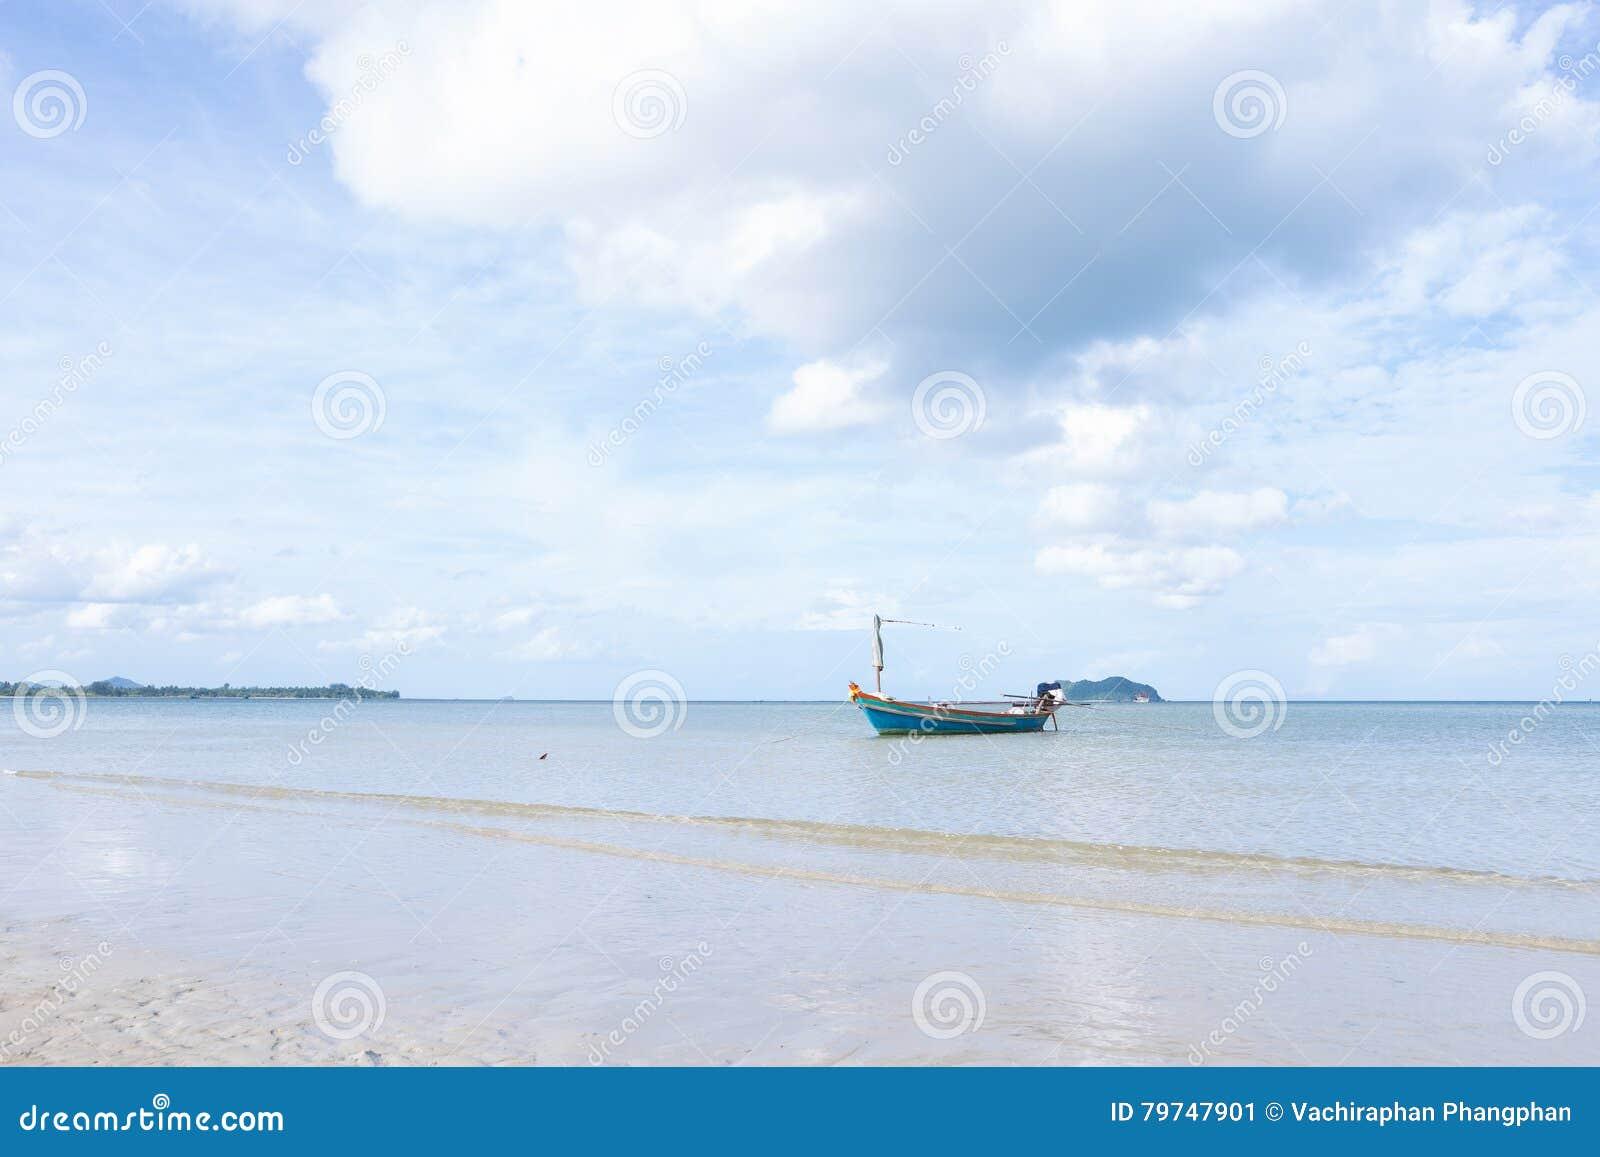 Pequeño barco de pesca